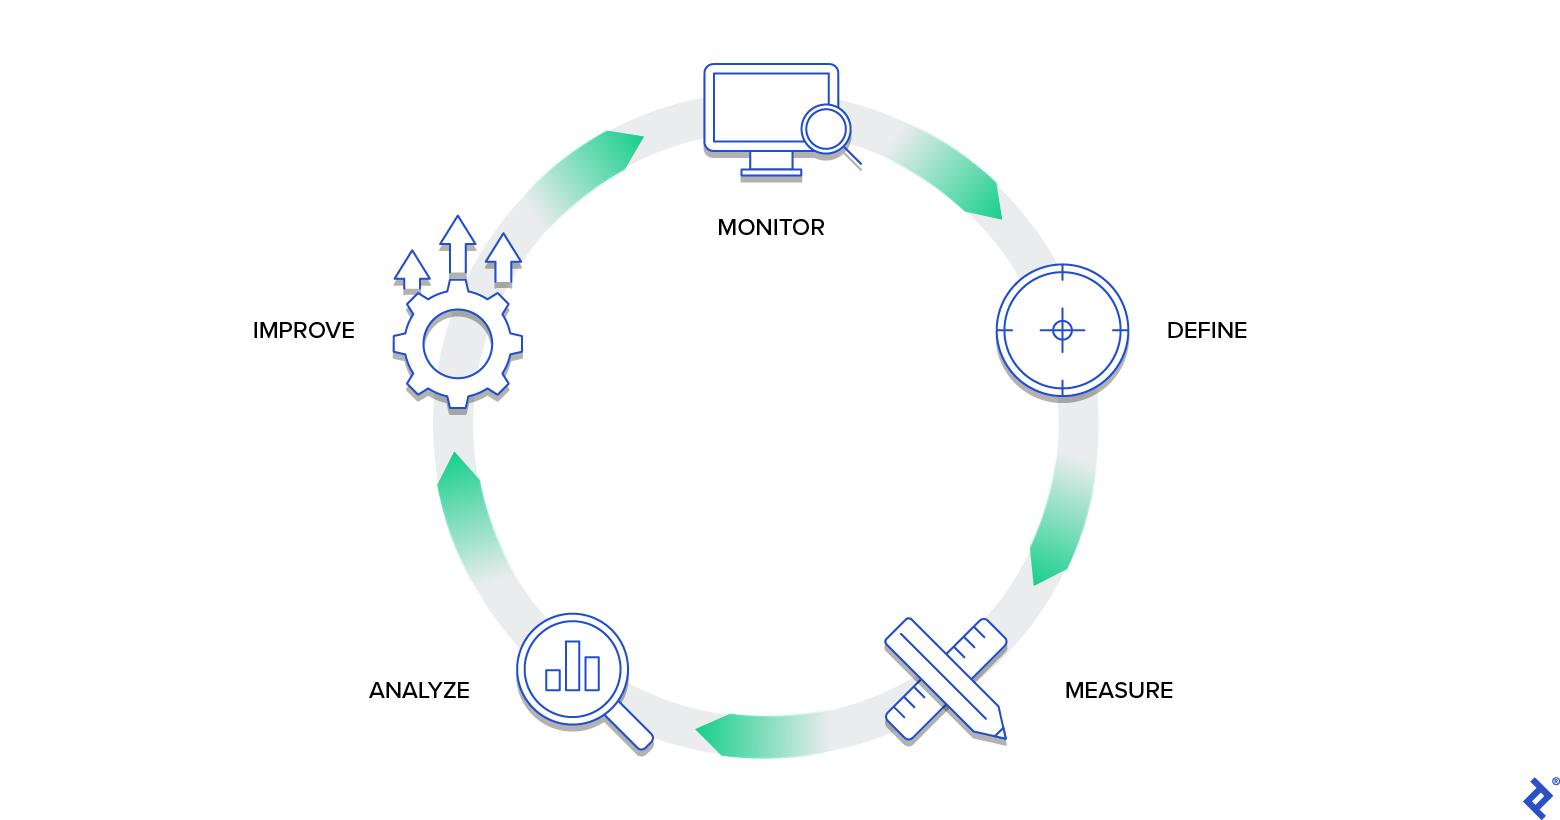 Data quality circuit loop